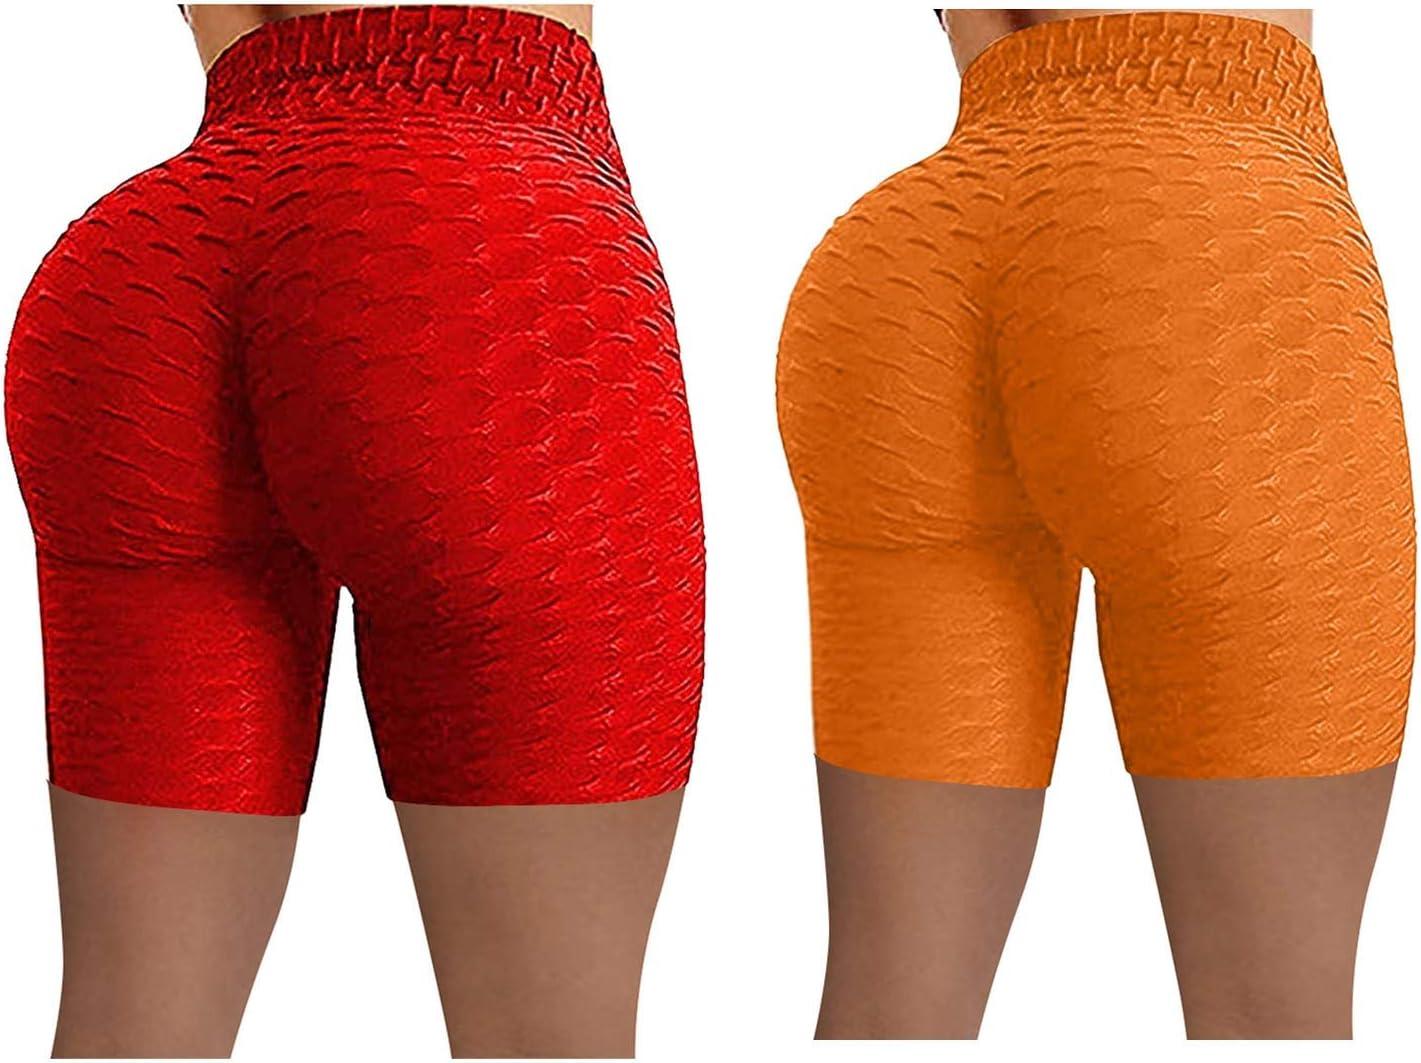 SALENEW very popular Mail order cheap Gwewei4df Women's 2PC High Waist Yoga Hip Bubble Pants Lifting S